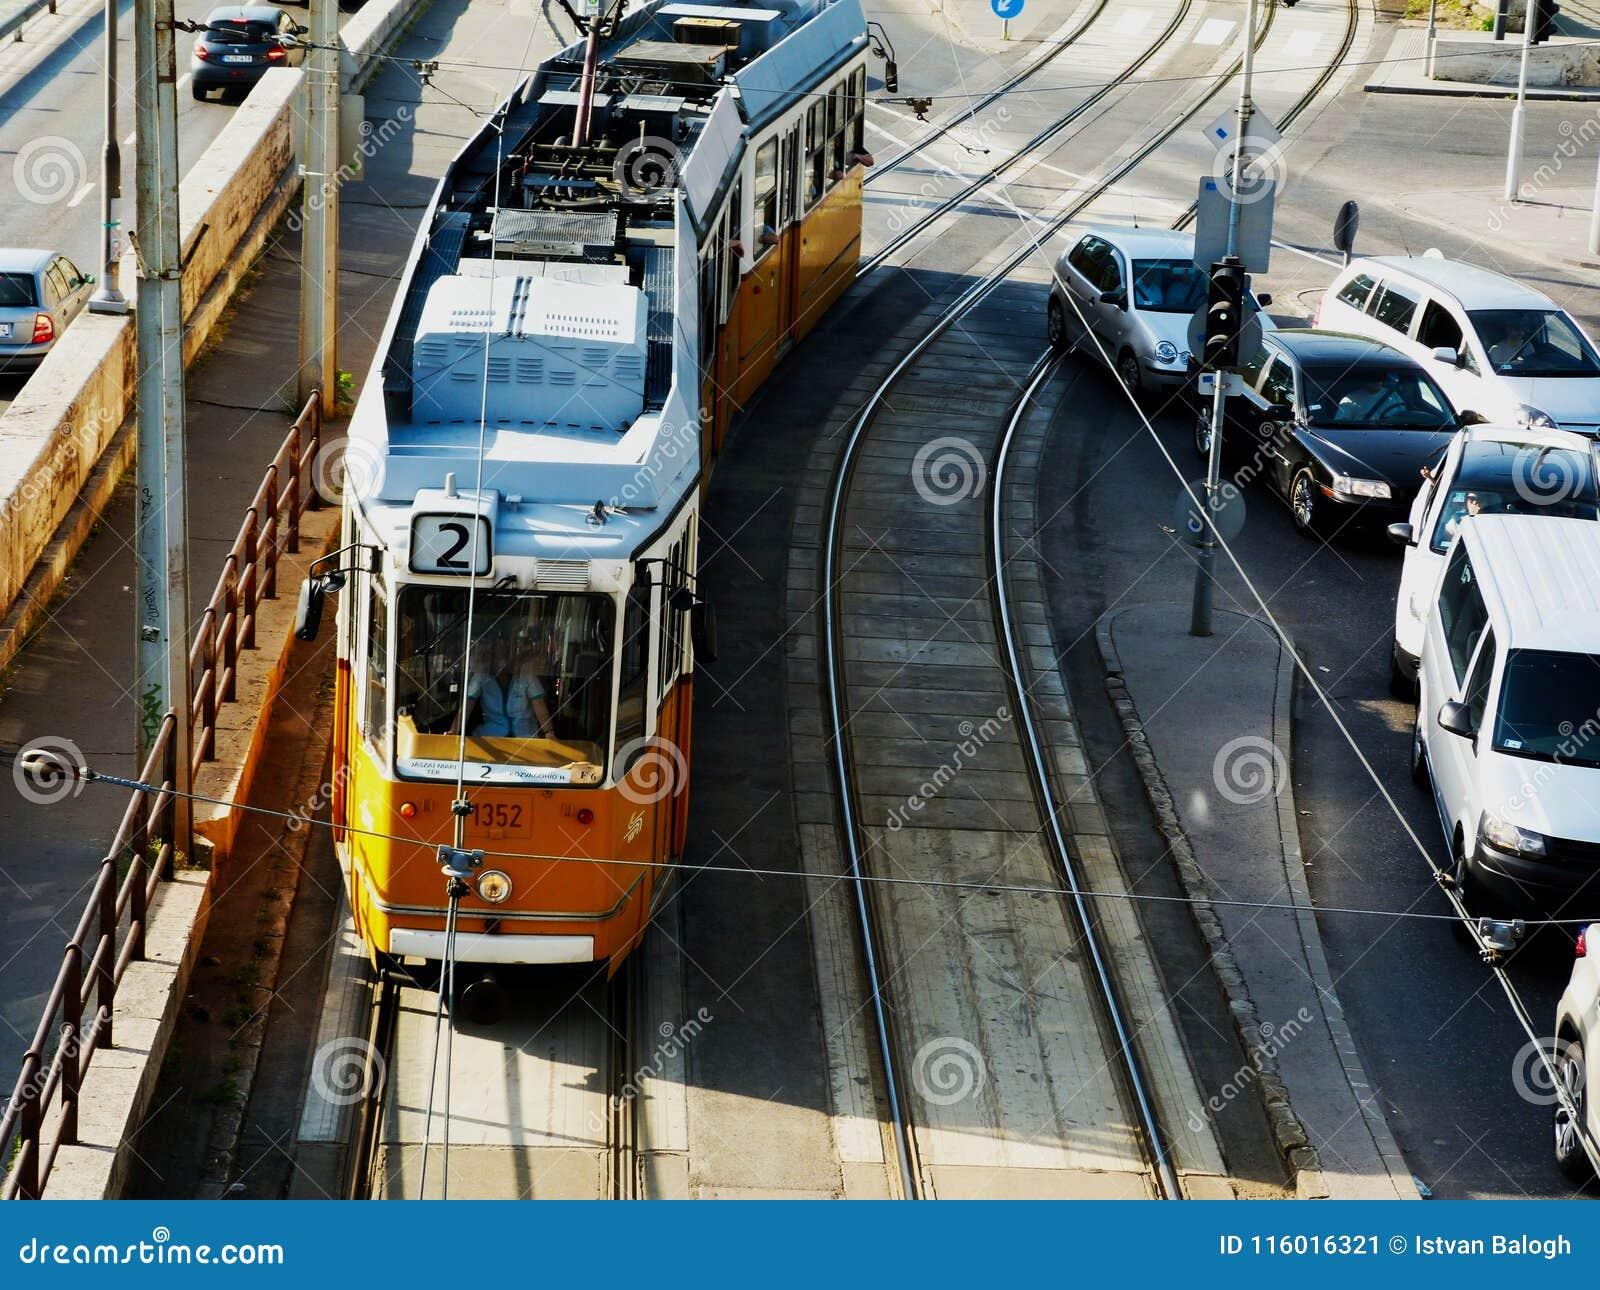 Tranvía amarilla en Budapest, vista desde arriba